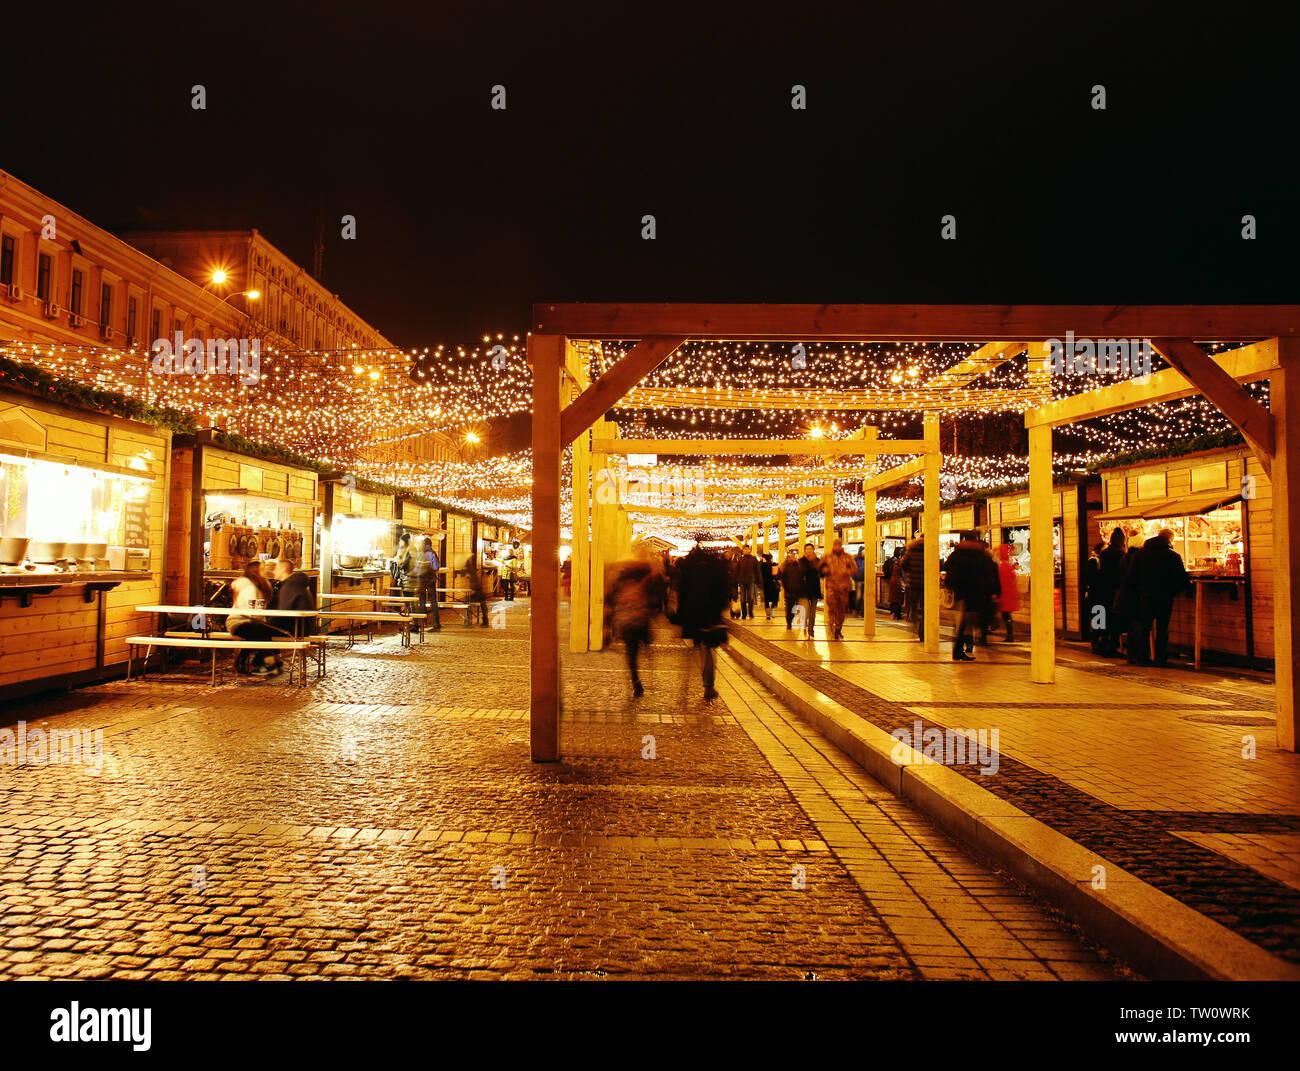 Walking people on Christmas fair - Stock Image